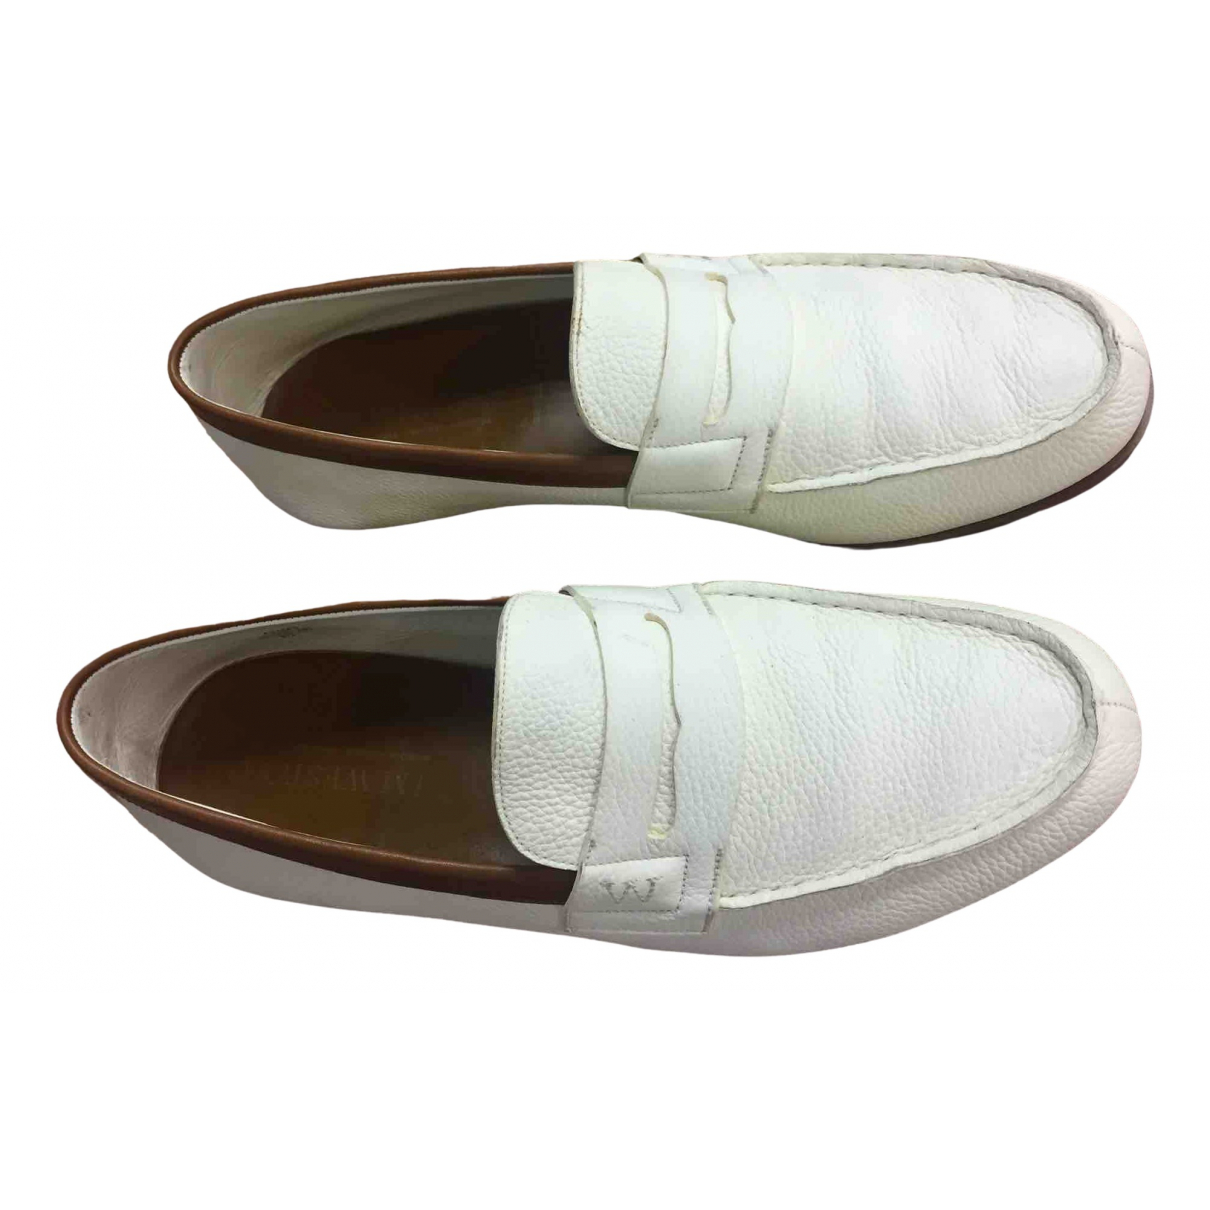 Jm Weston \N Beige Leather Flats for Men 43 EU